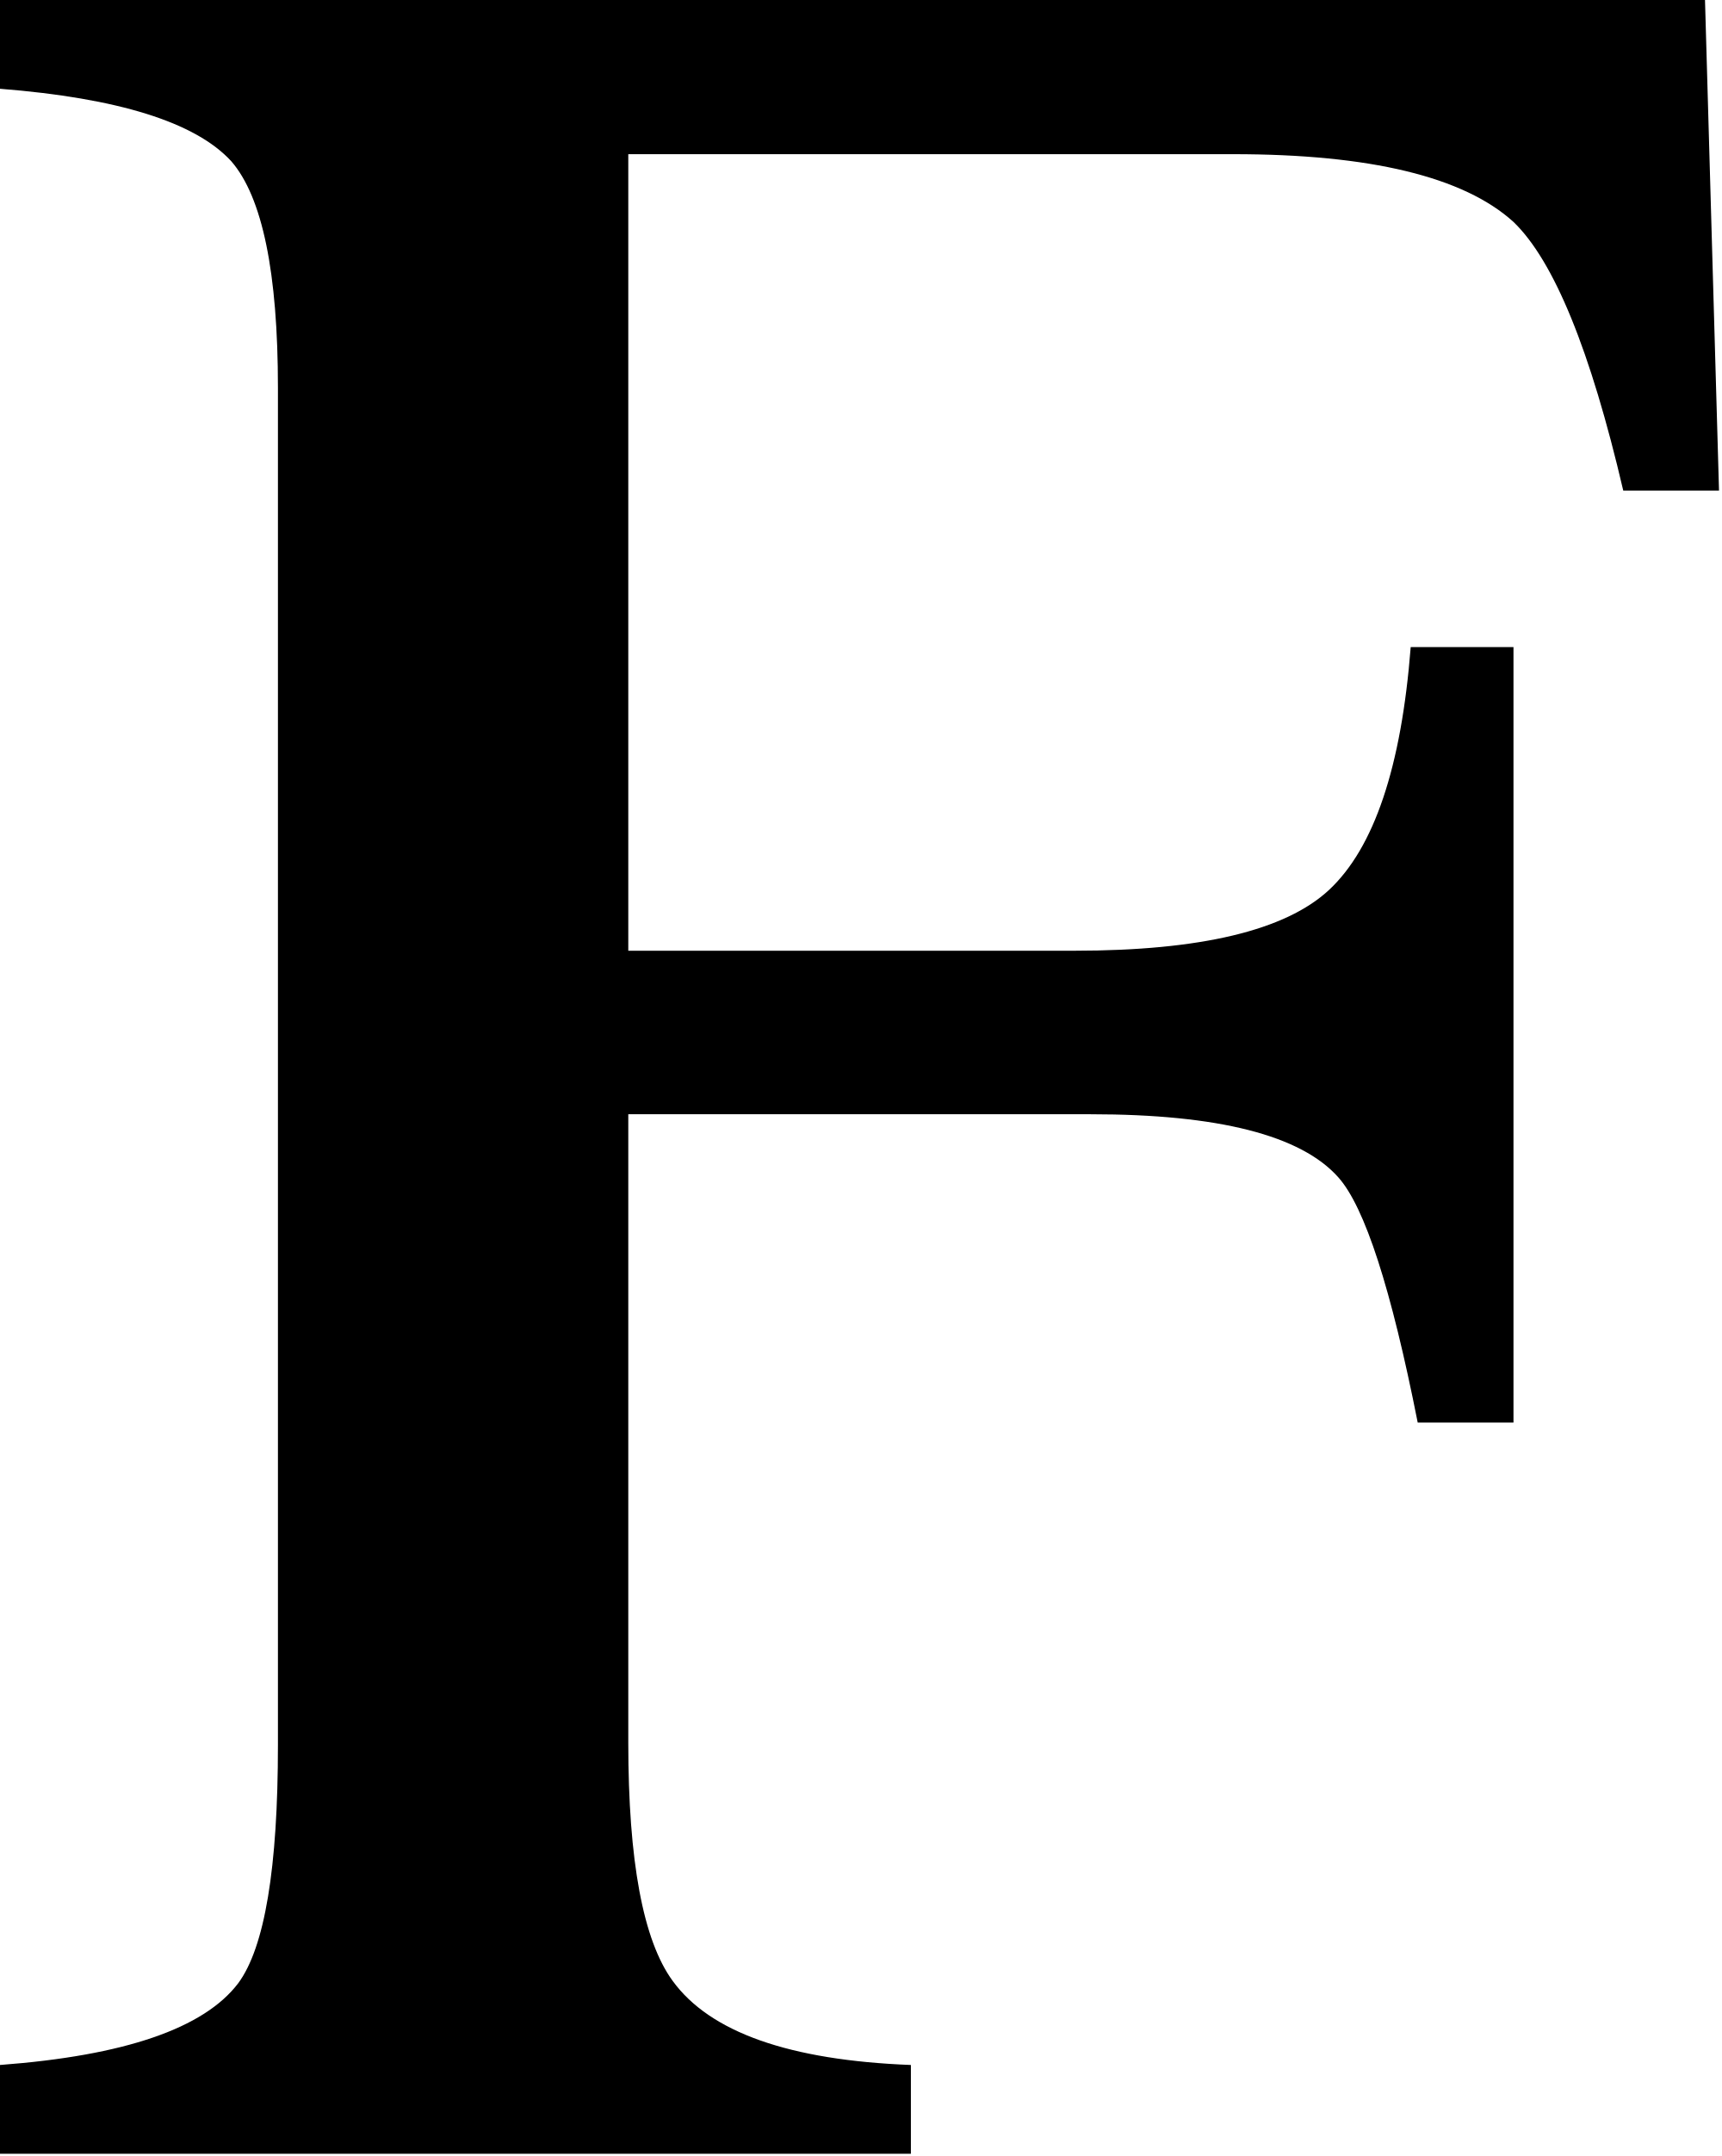 HD 19 Letter F Free Huge Freebie For Powerpoint Presentations.